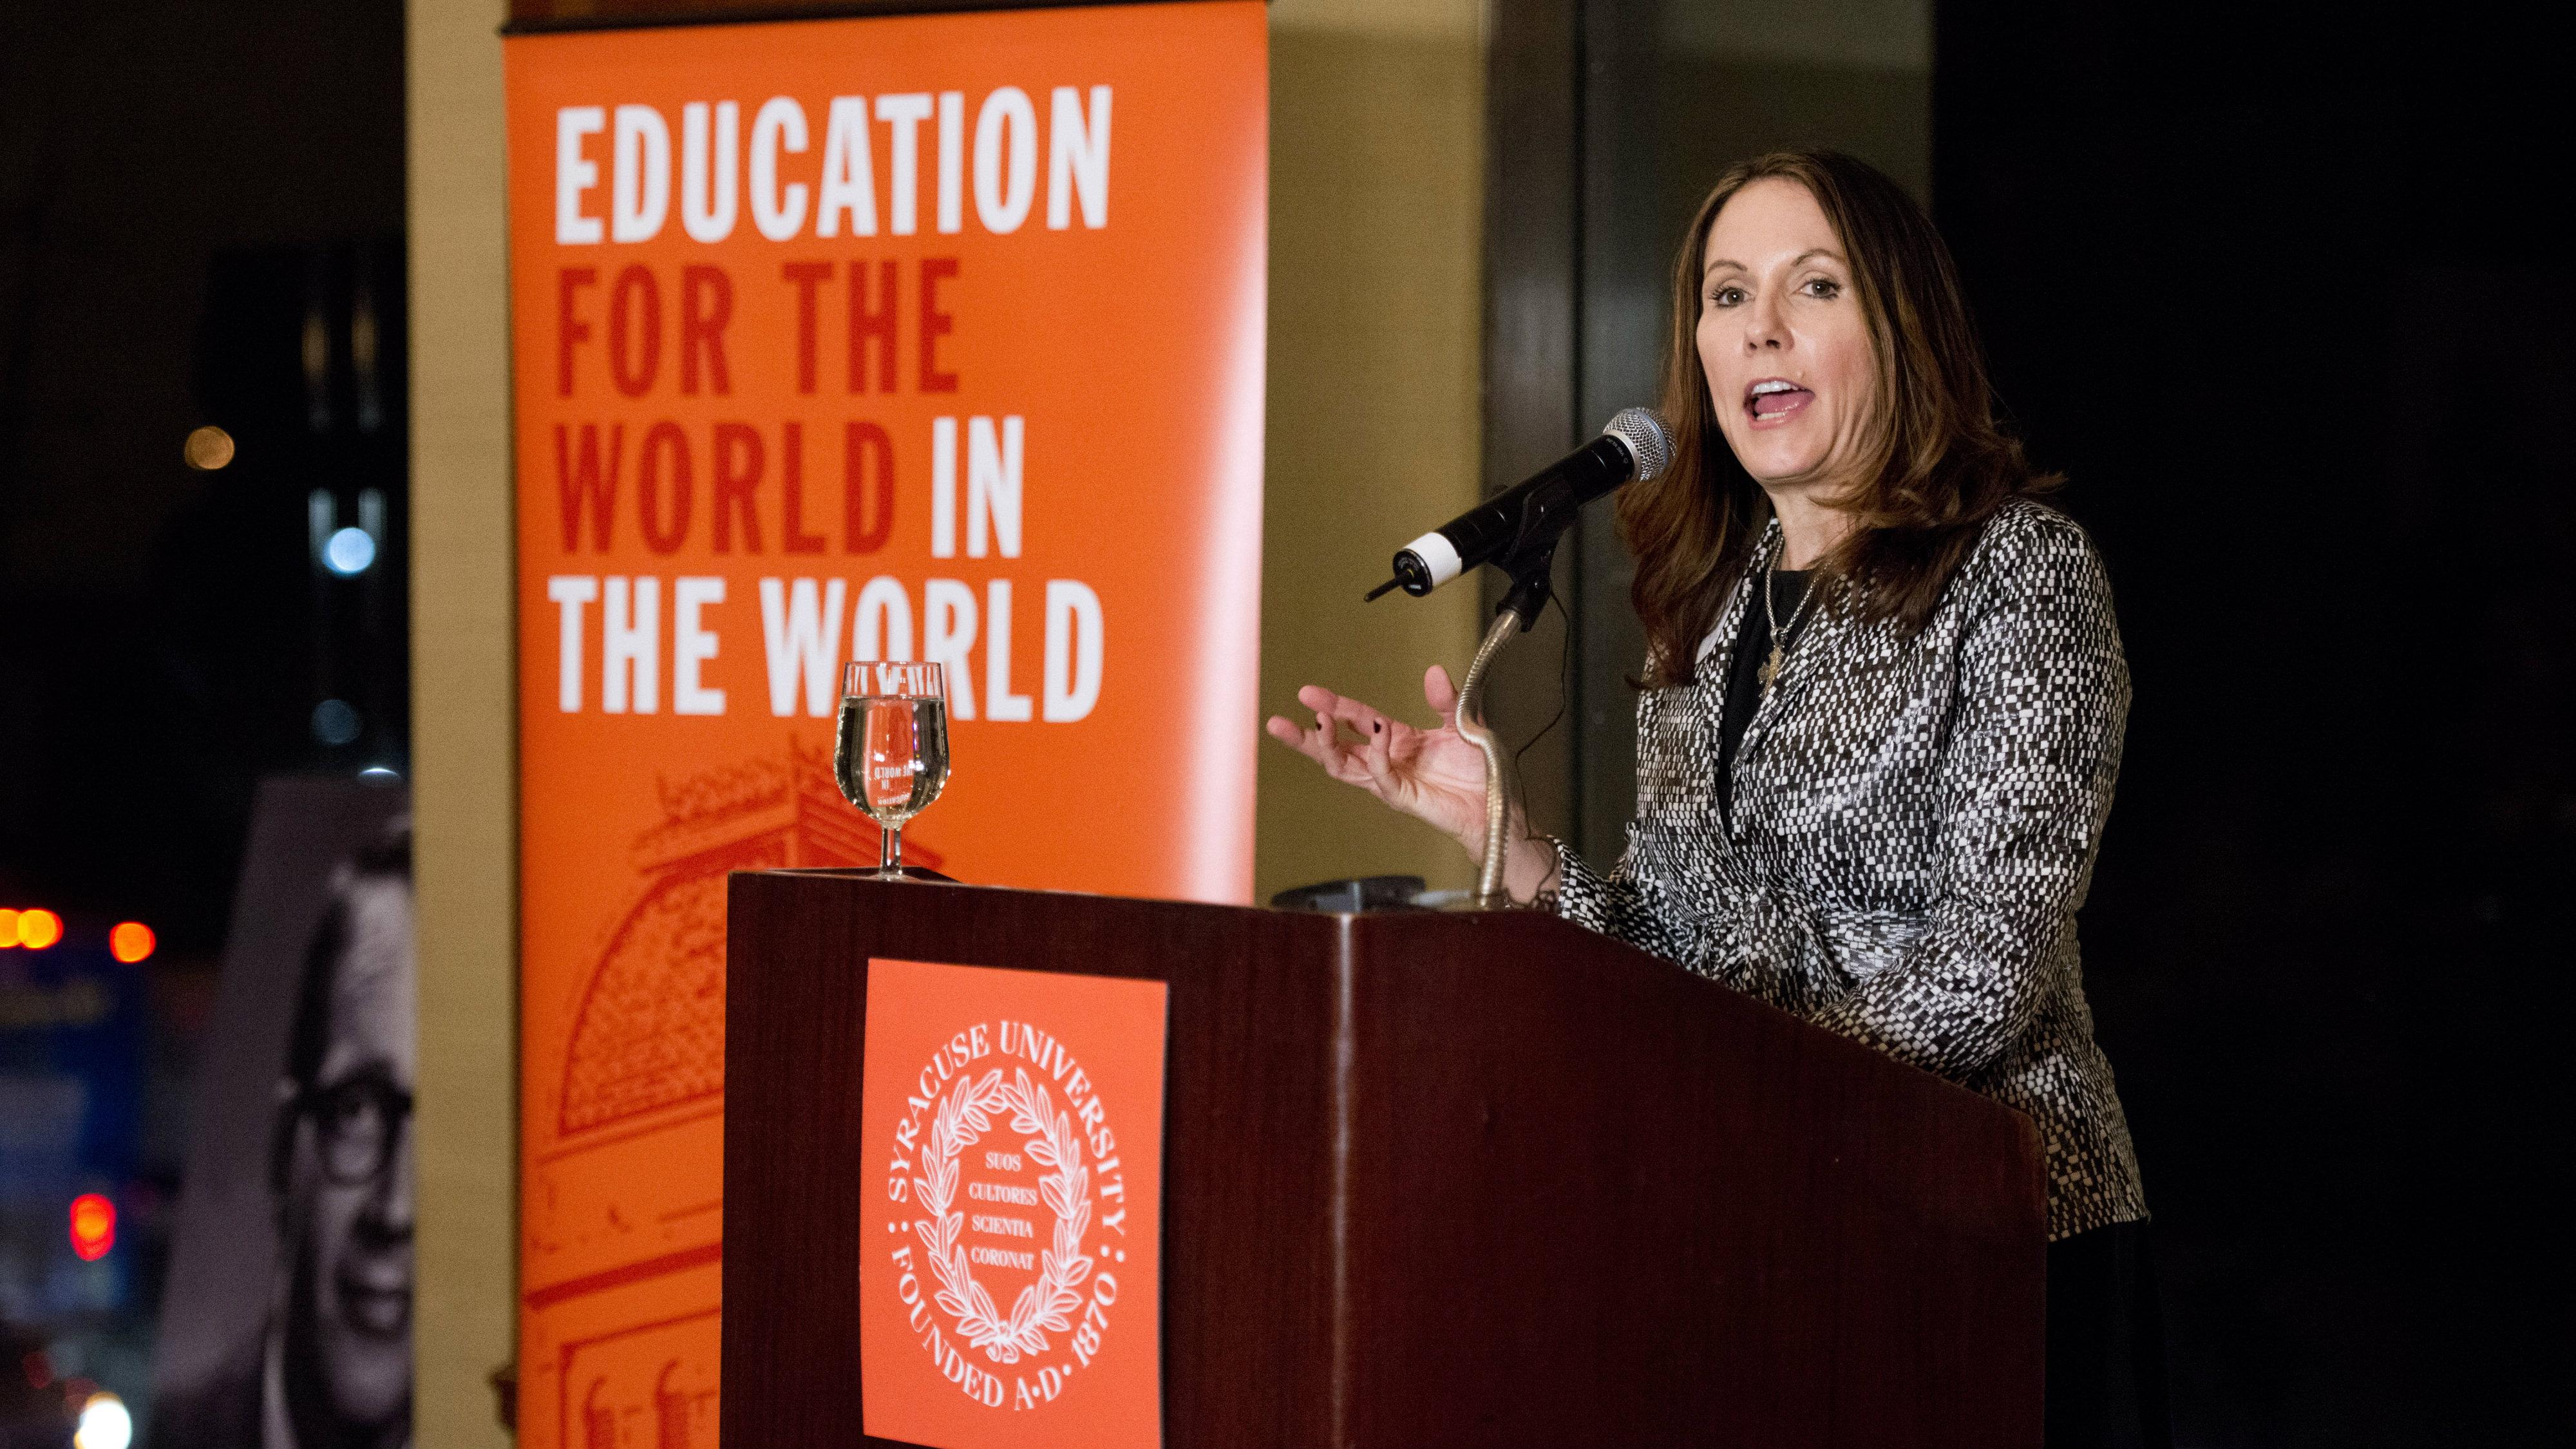 Syracuse University faculty member and author Mary Karr speaks at the university's creative writing program celebration, on Nov. 15, 2012, in New York.